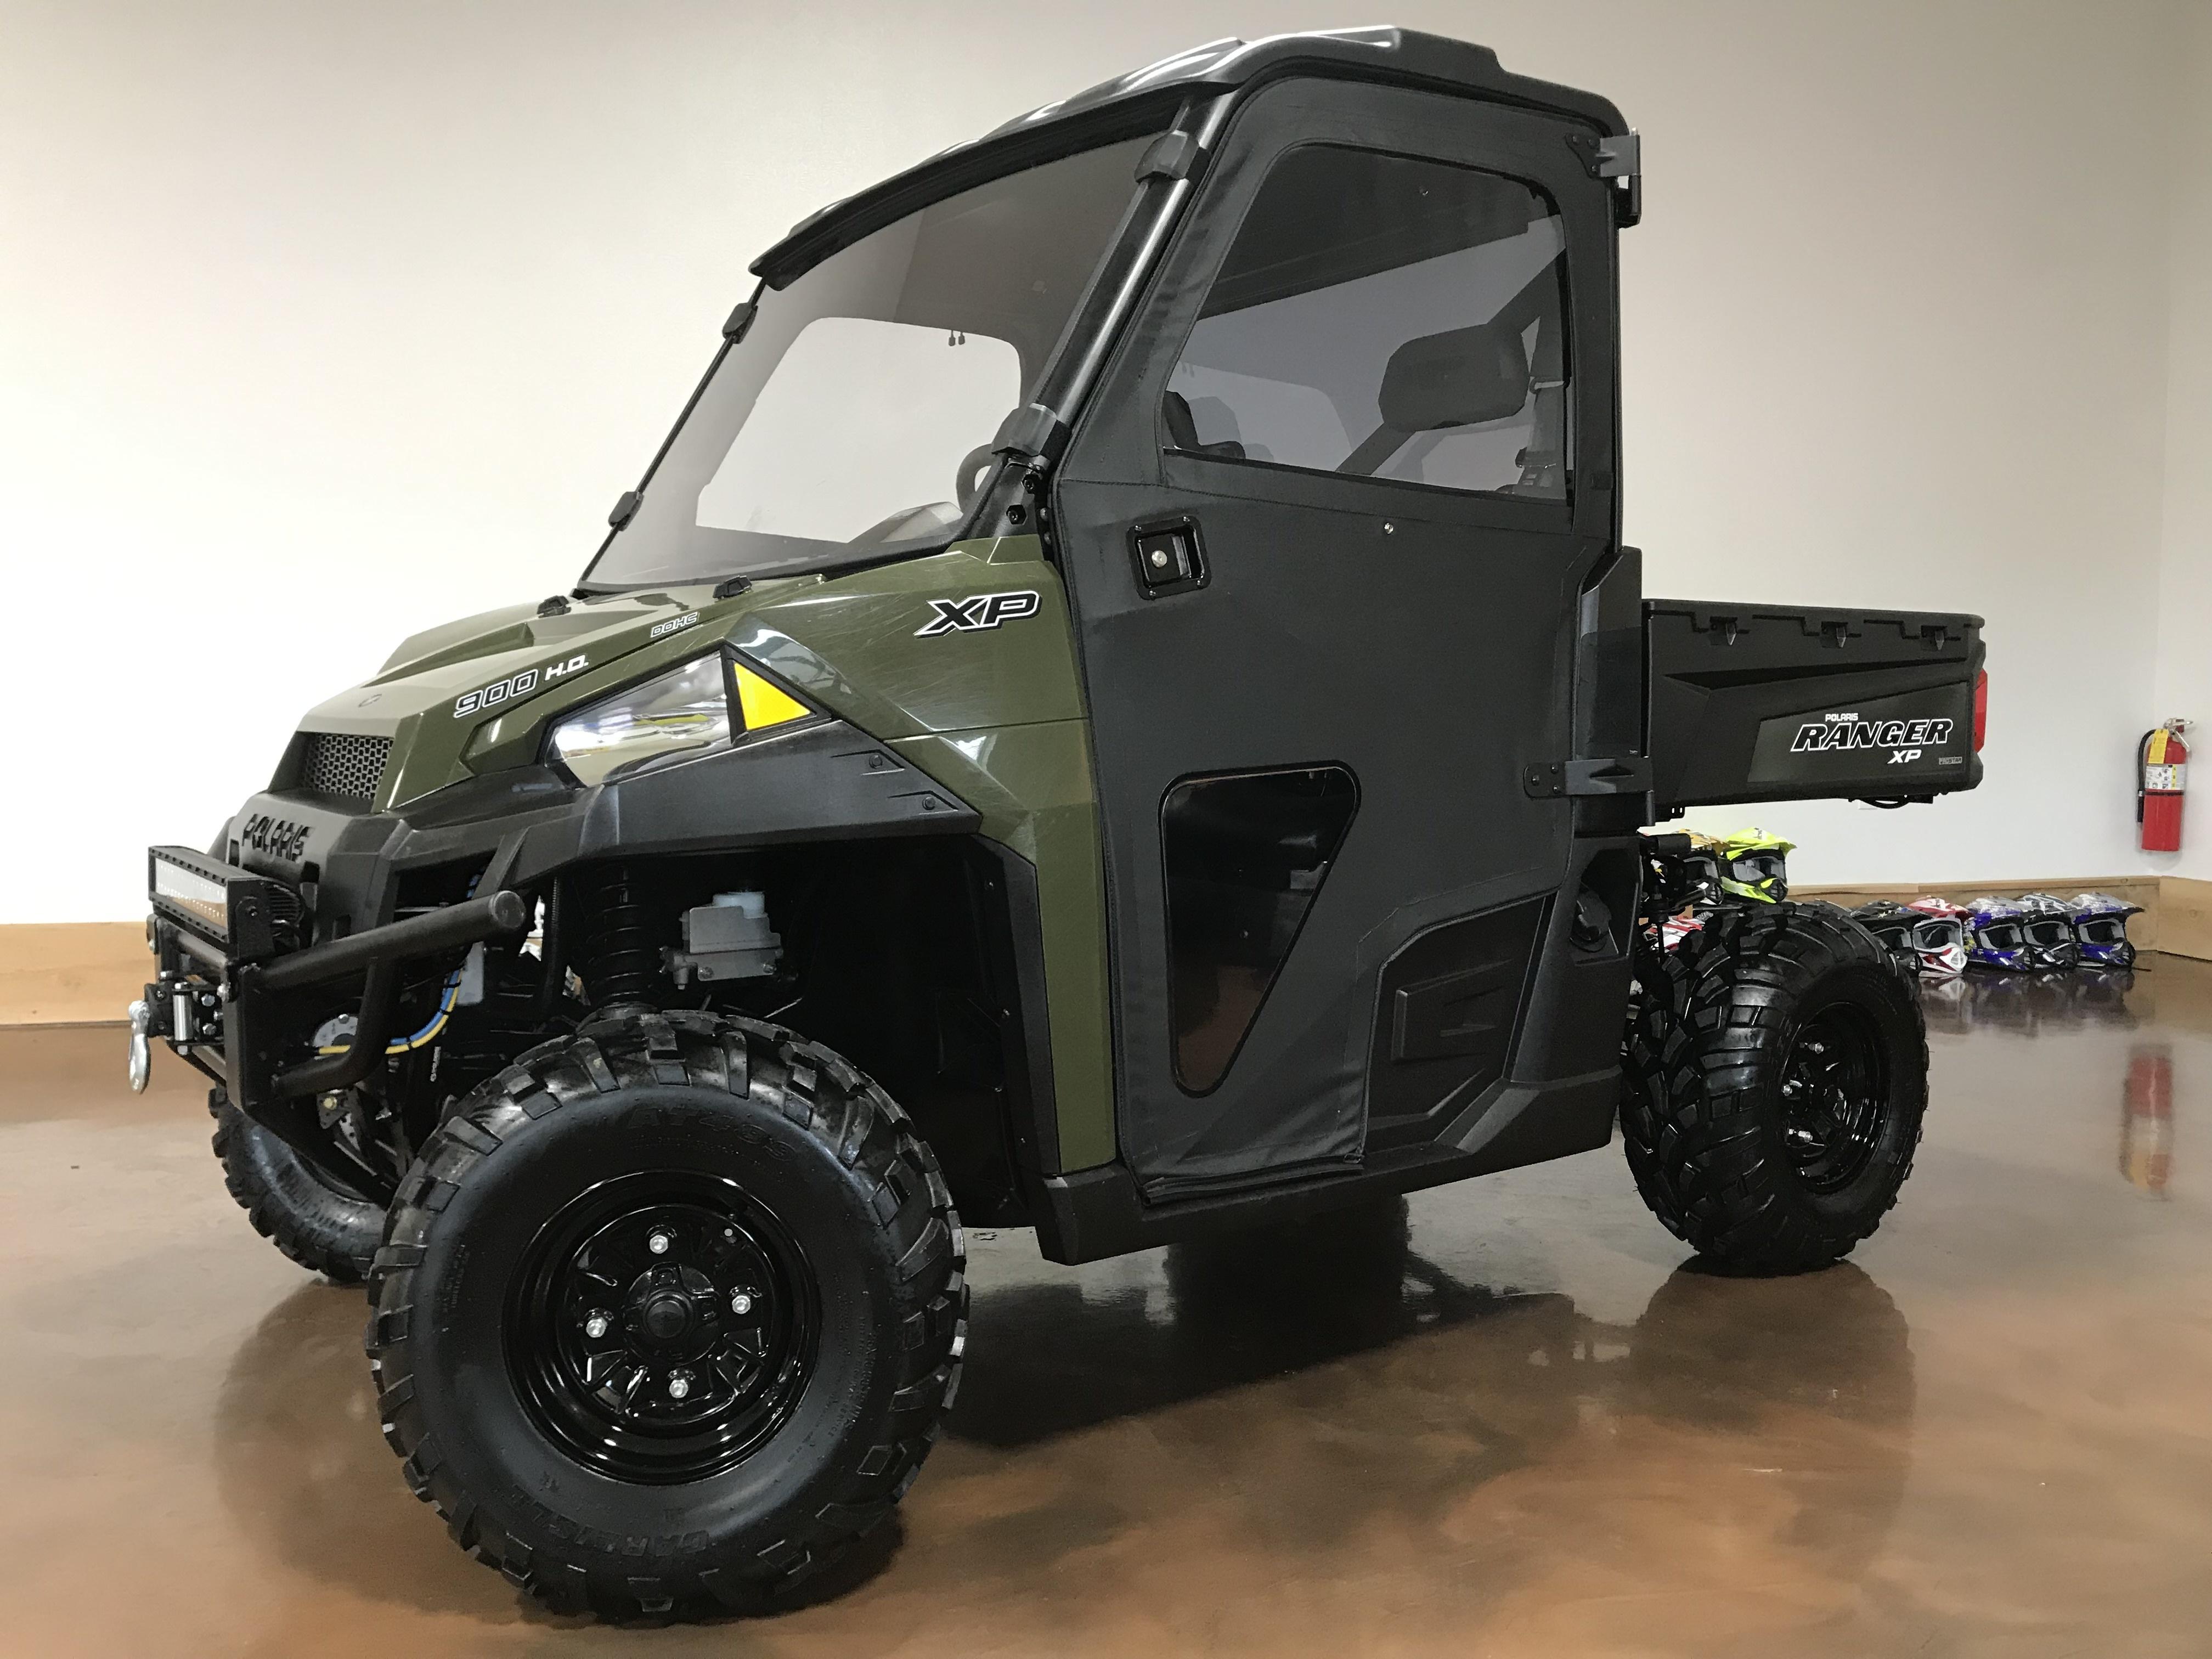 2018 Polaris Ranger XP 900 EPS - Full Cab & ONLY 540 Miles! 79839